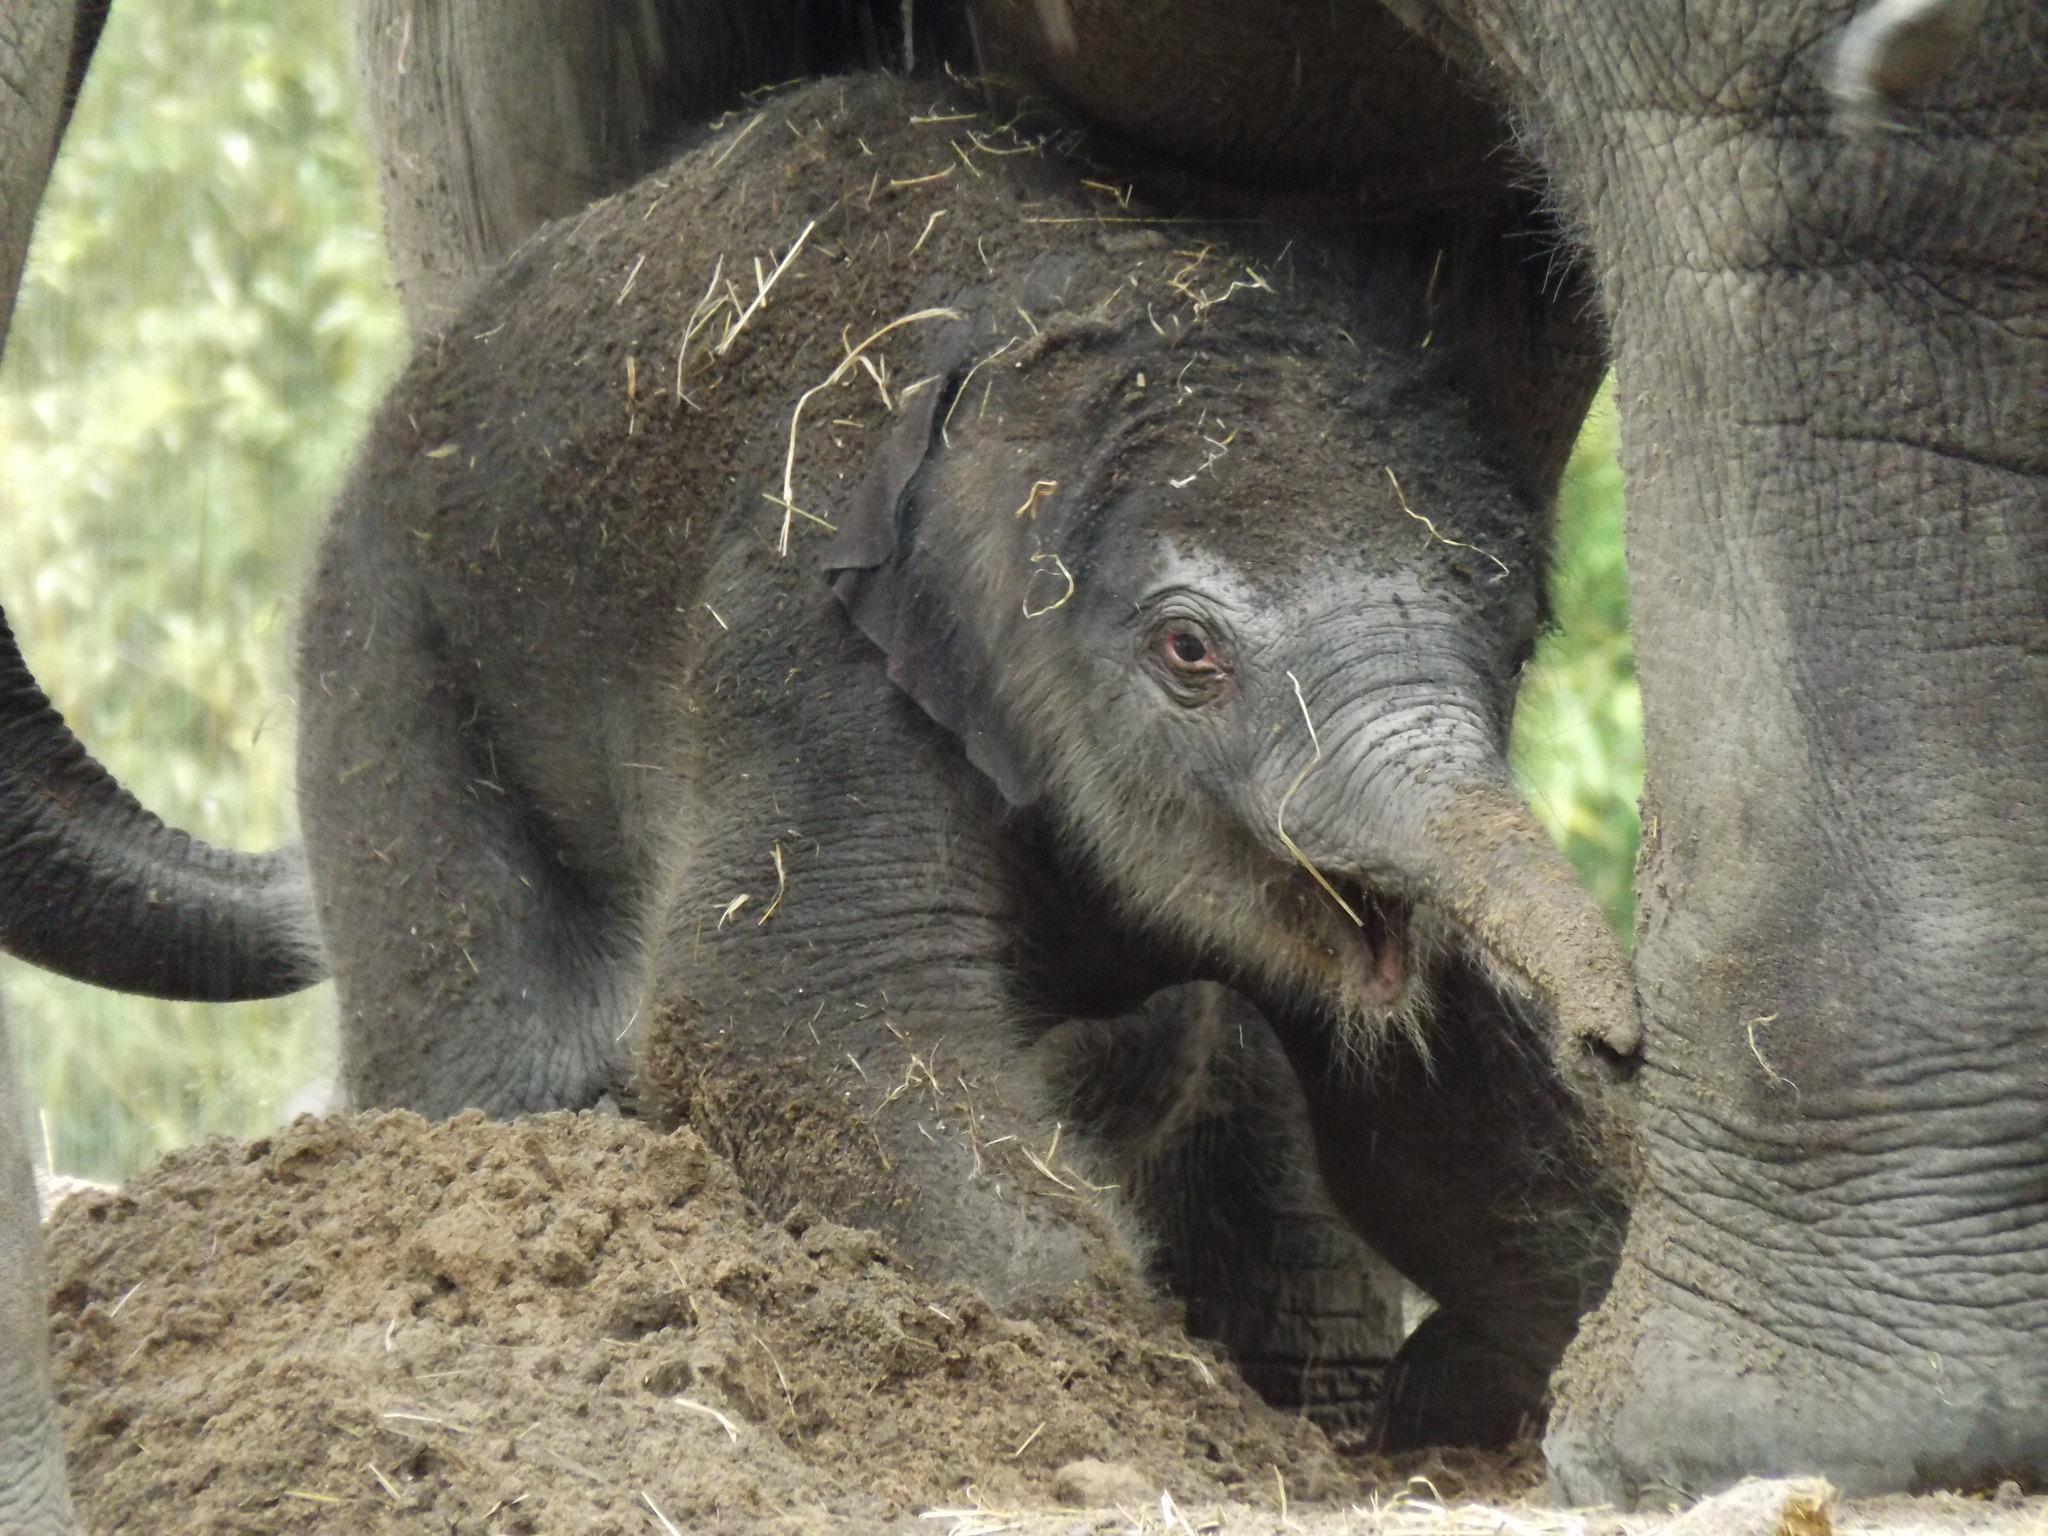 Aziatisch olifantje Sunay.